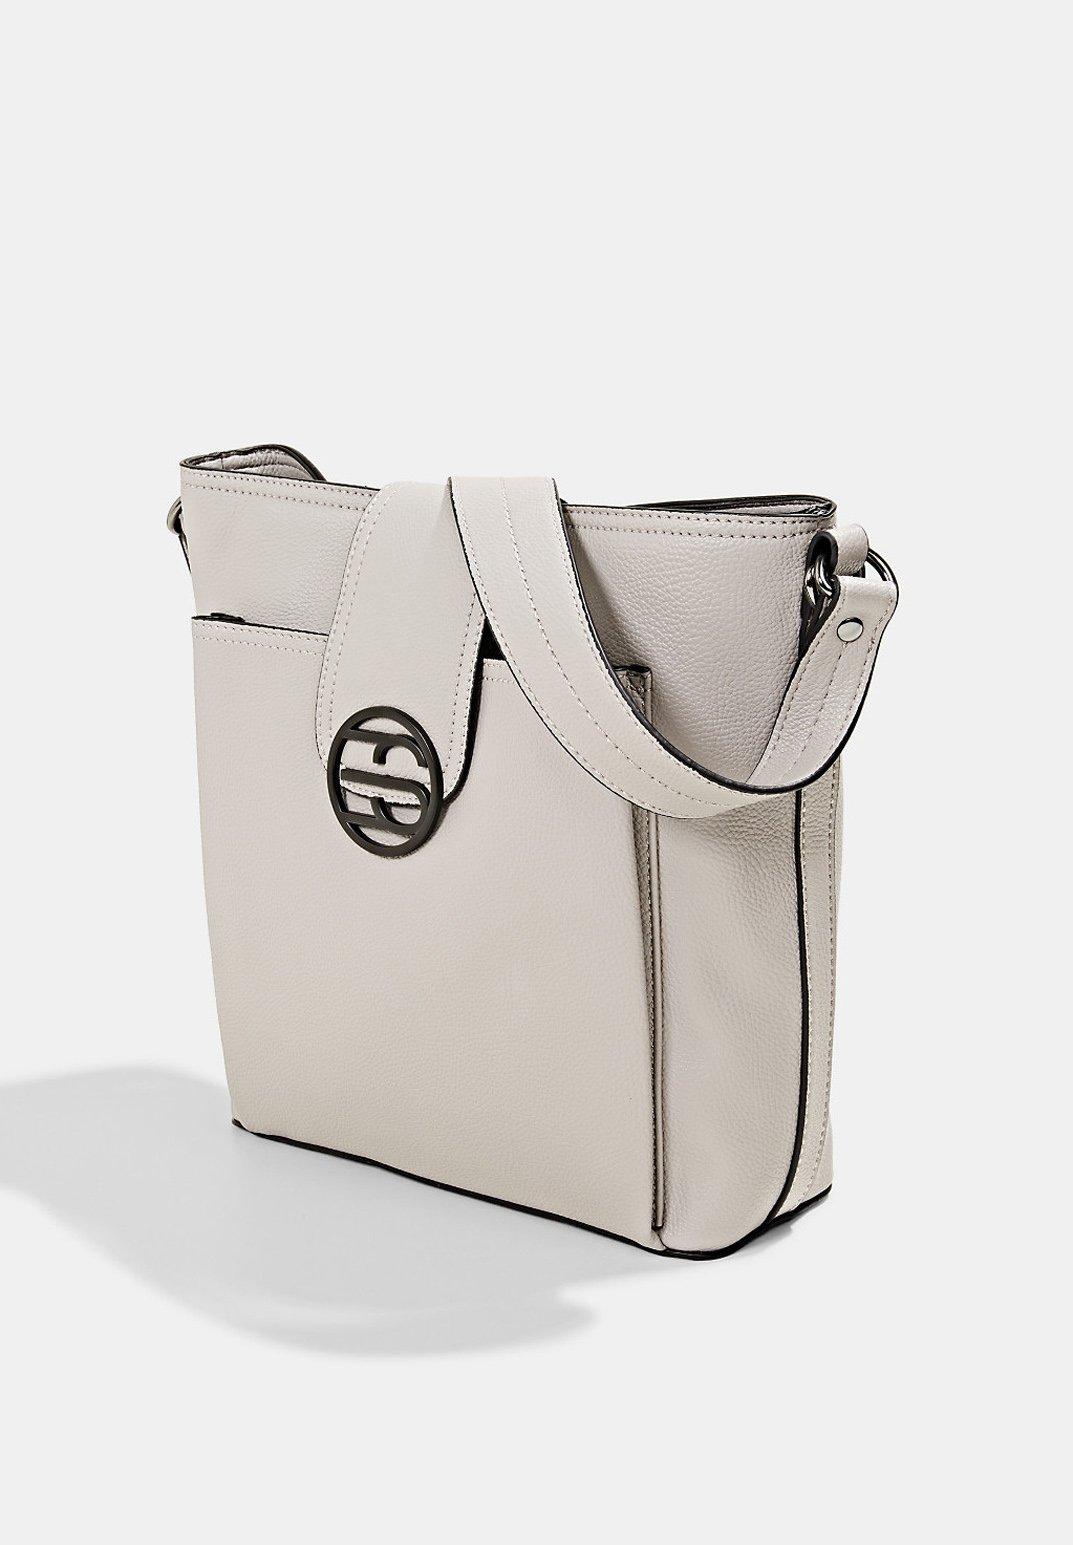 Esprit HOBO Handtasche light grey/hellgrau